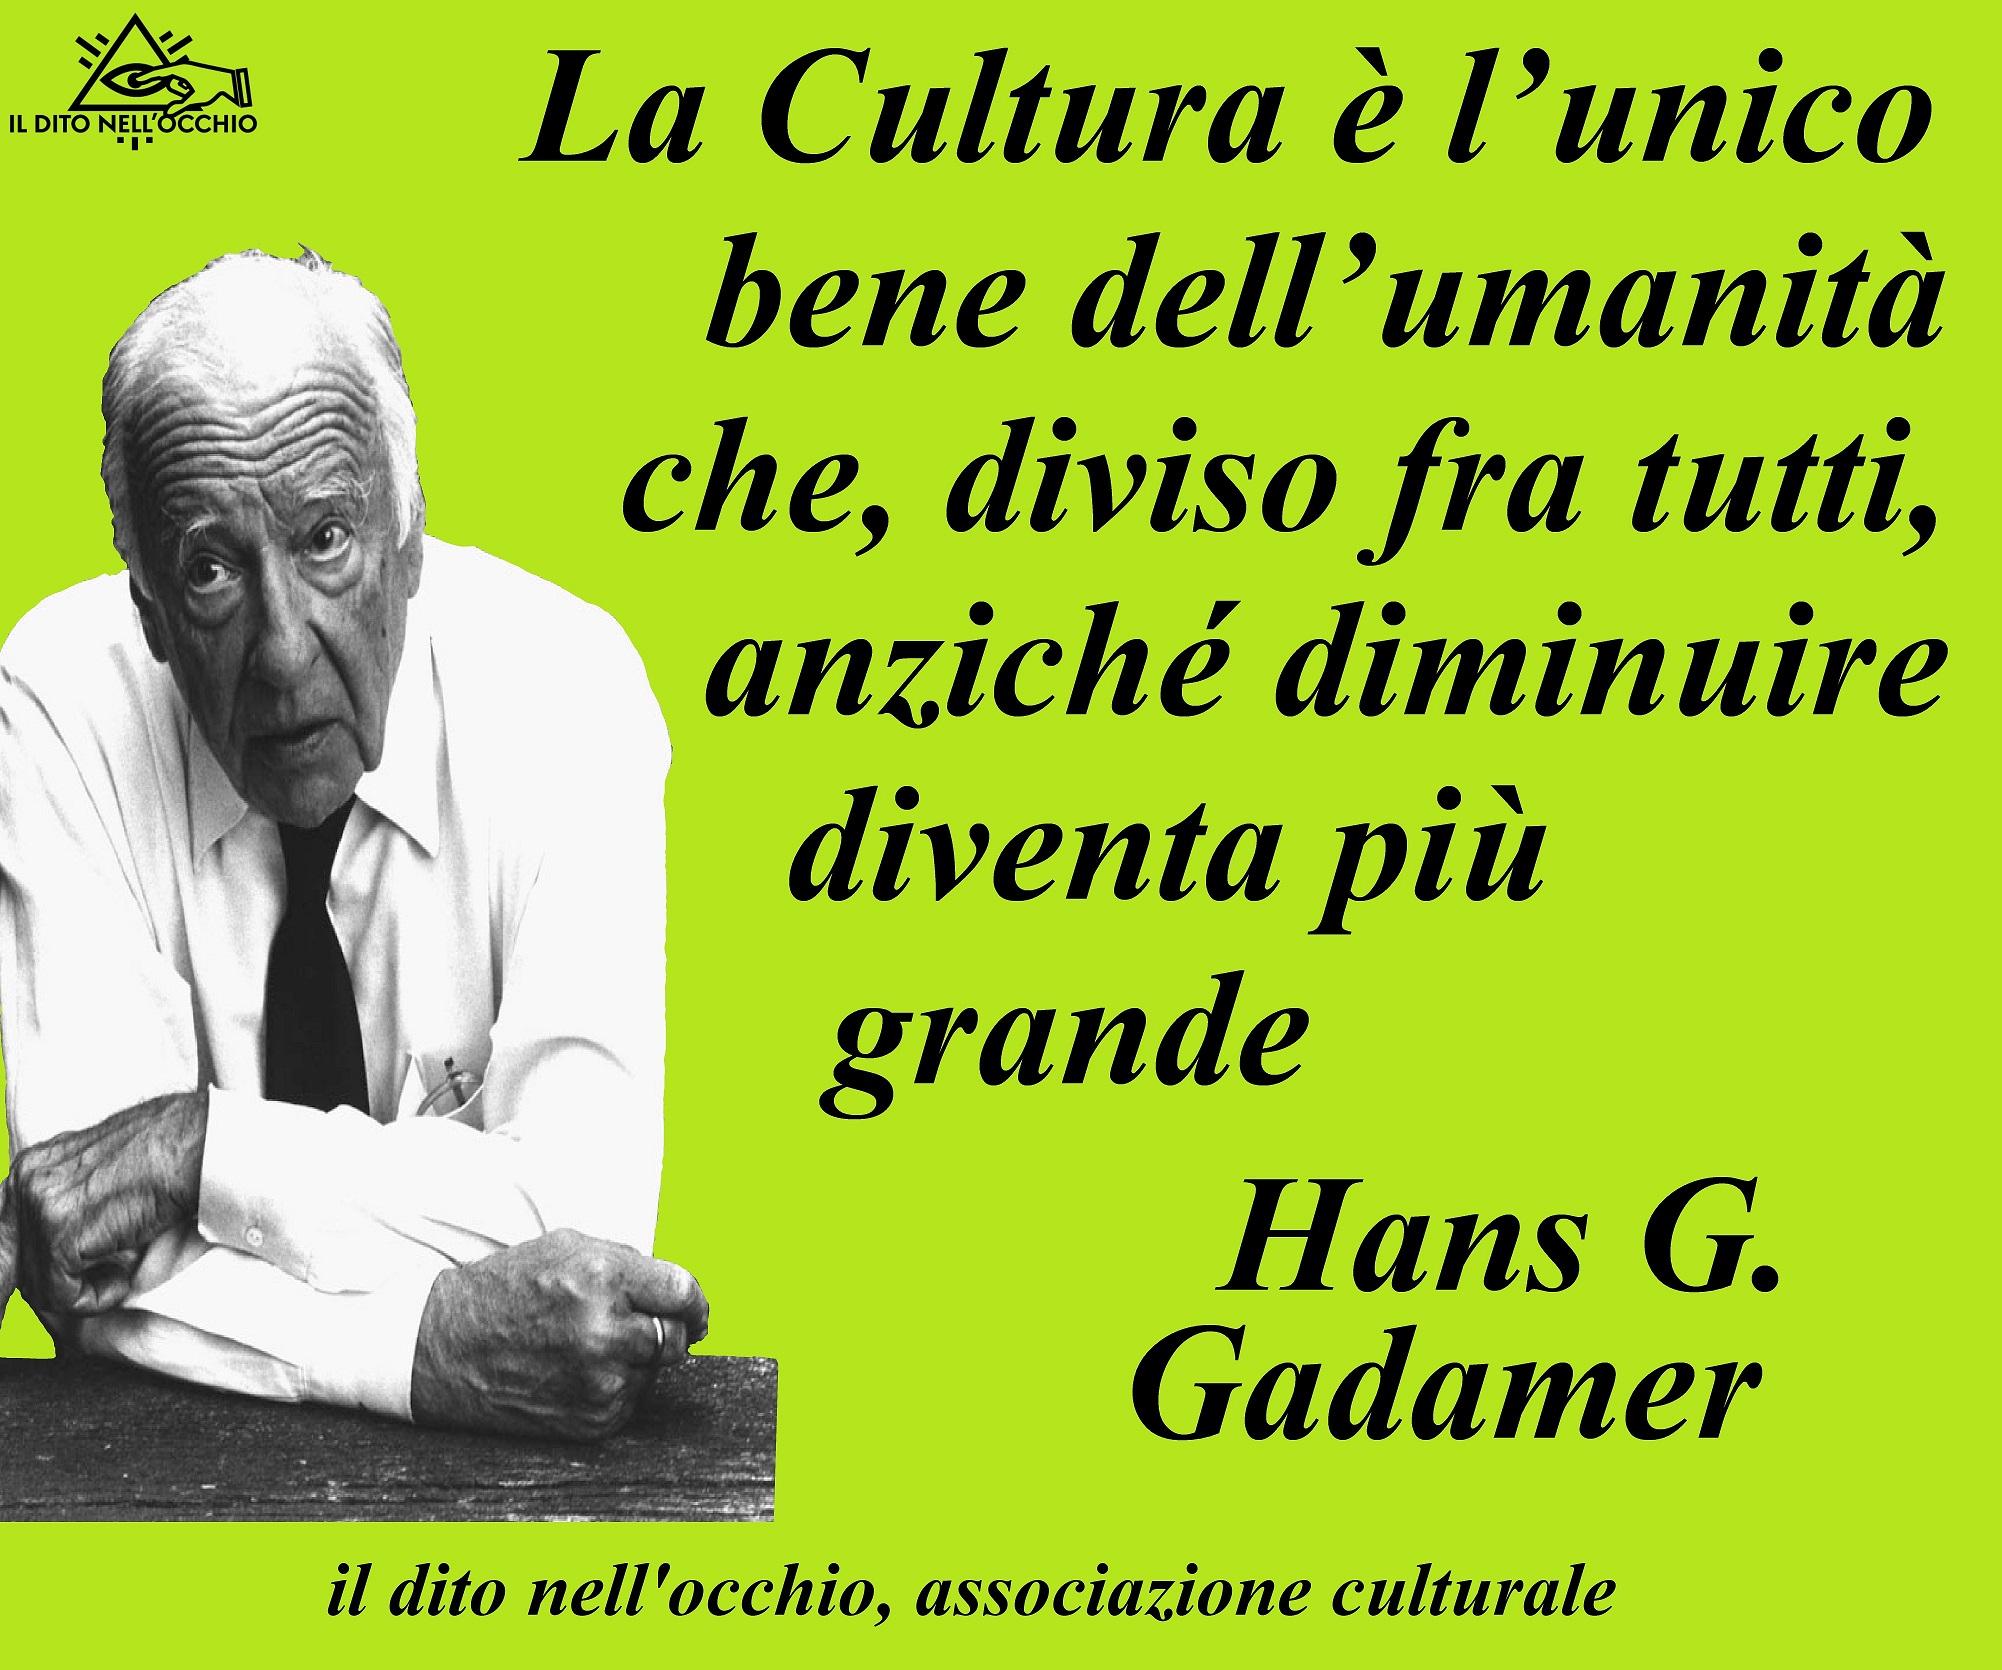 Hans G. Gadamer